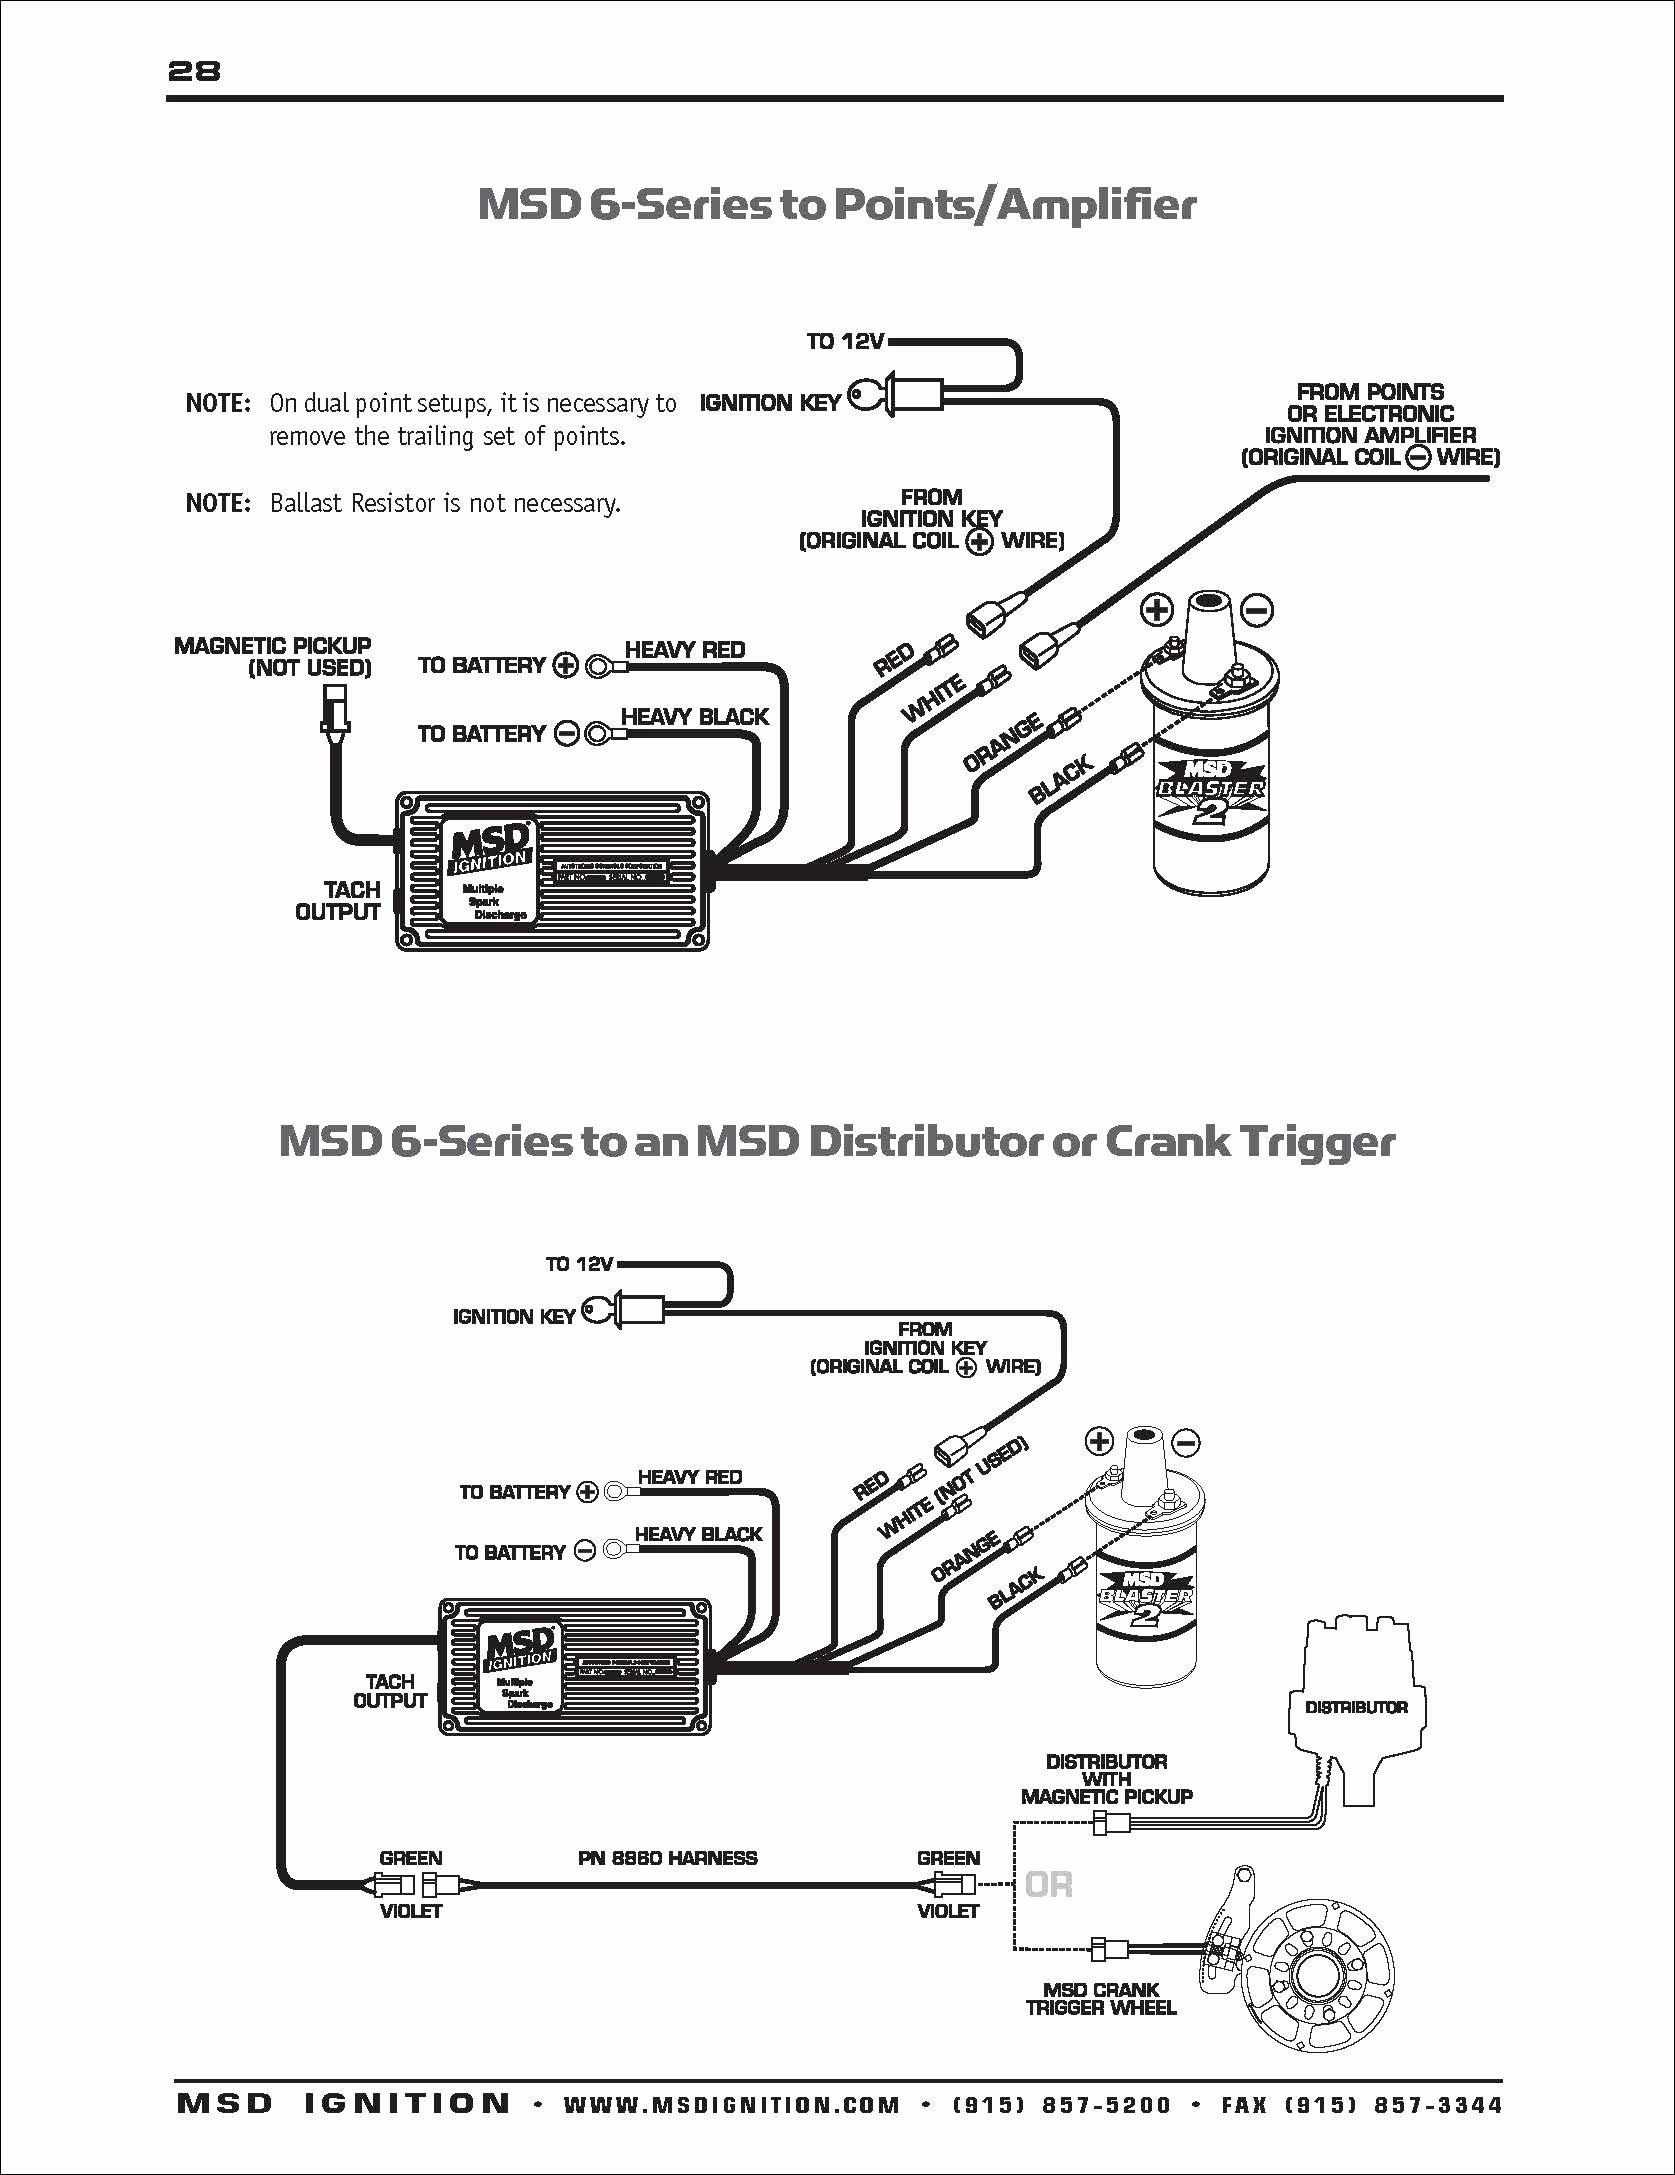 Ford Hei Distributor Wiring Diagram Luxury Wiring Diagram 40 Inspirational Hei Distributor Wiring Diagram Hei